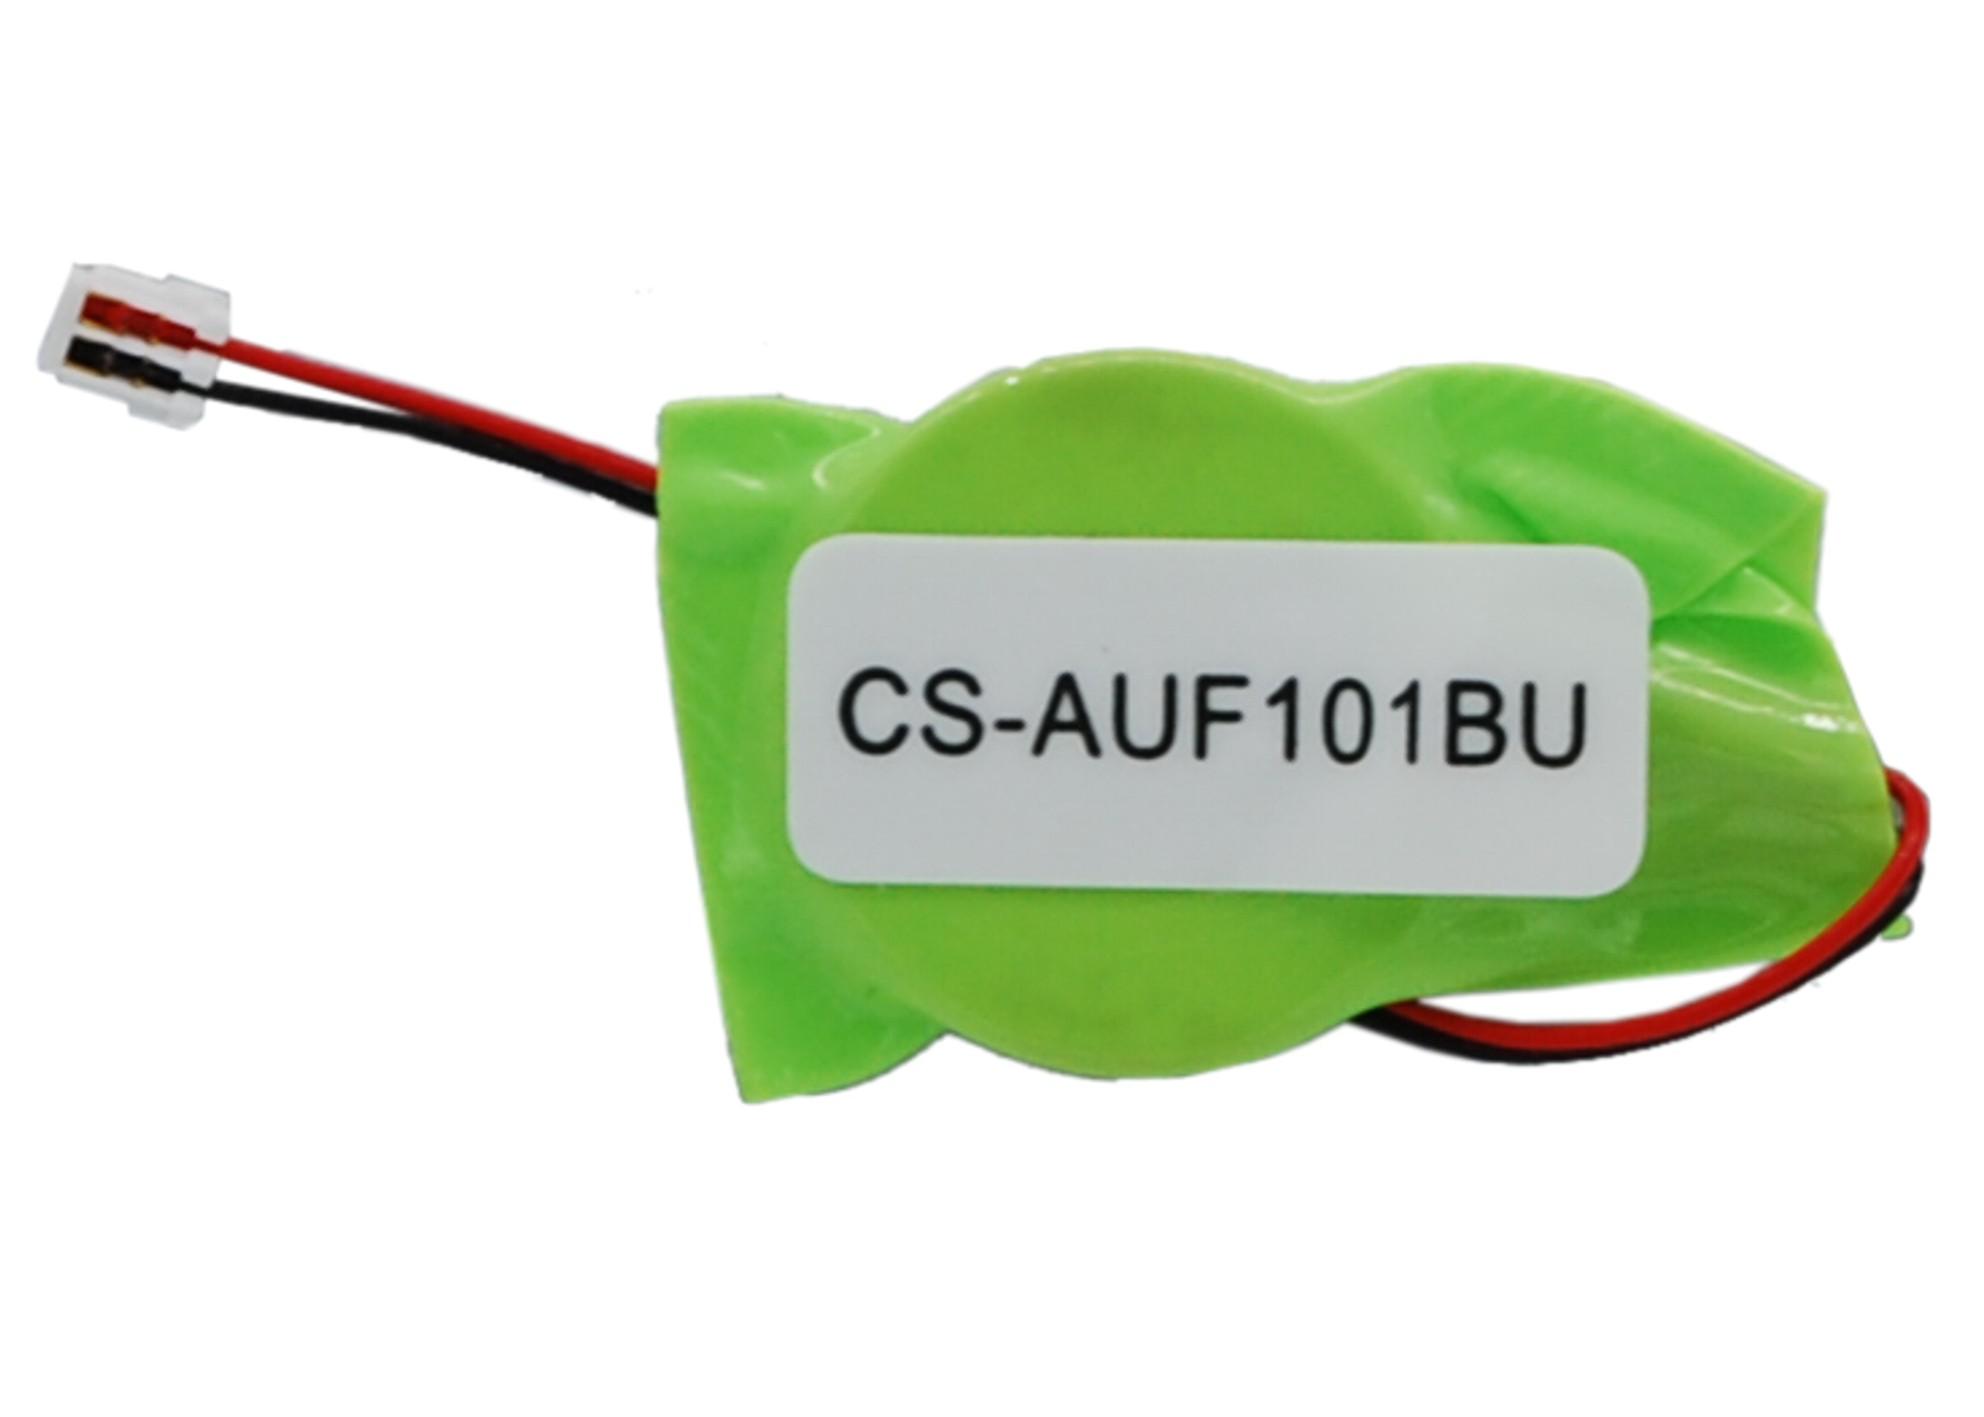 Cameron Sino baterie cmos pro ASUS Transformer Prime TF201-B1-CG 3V Li-ion 40mAh zelená - neoriginální